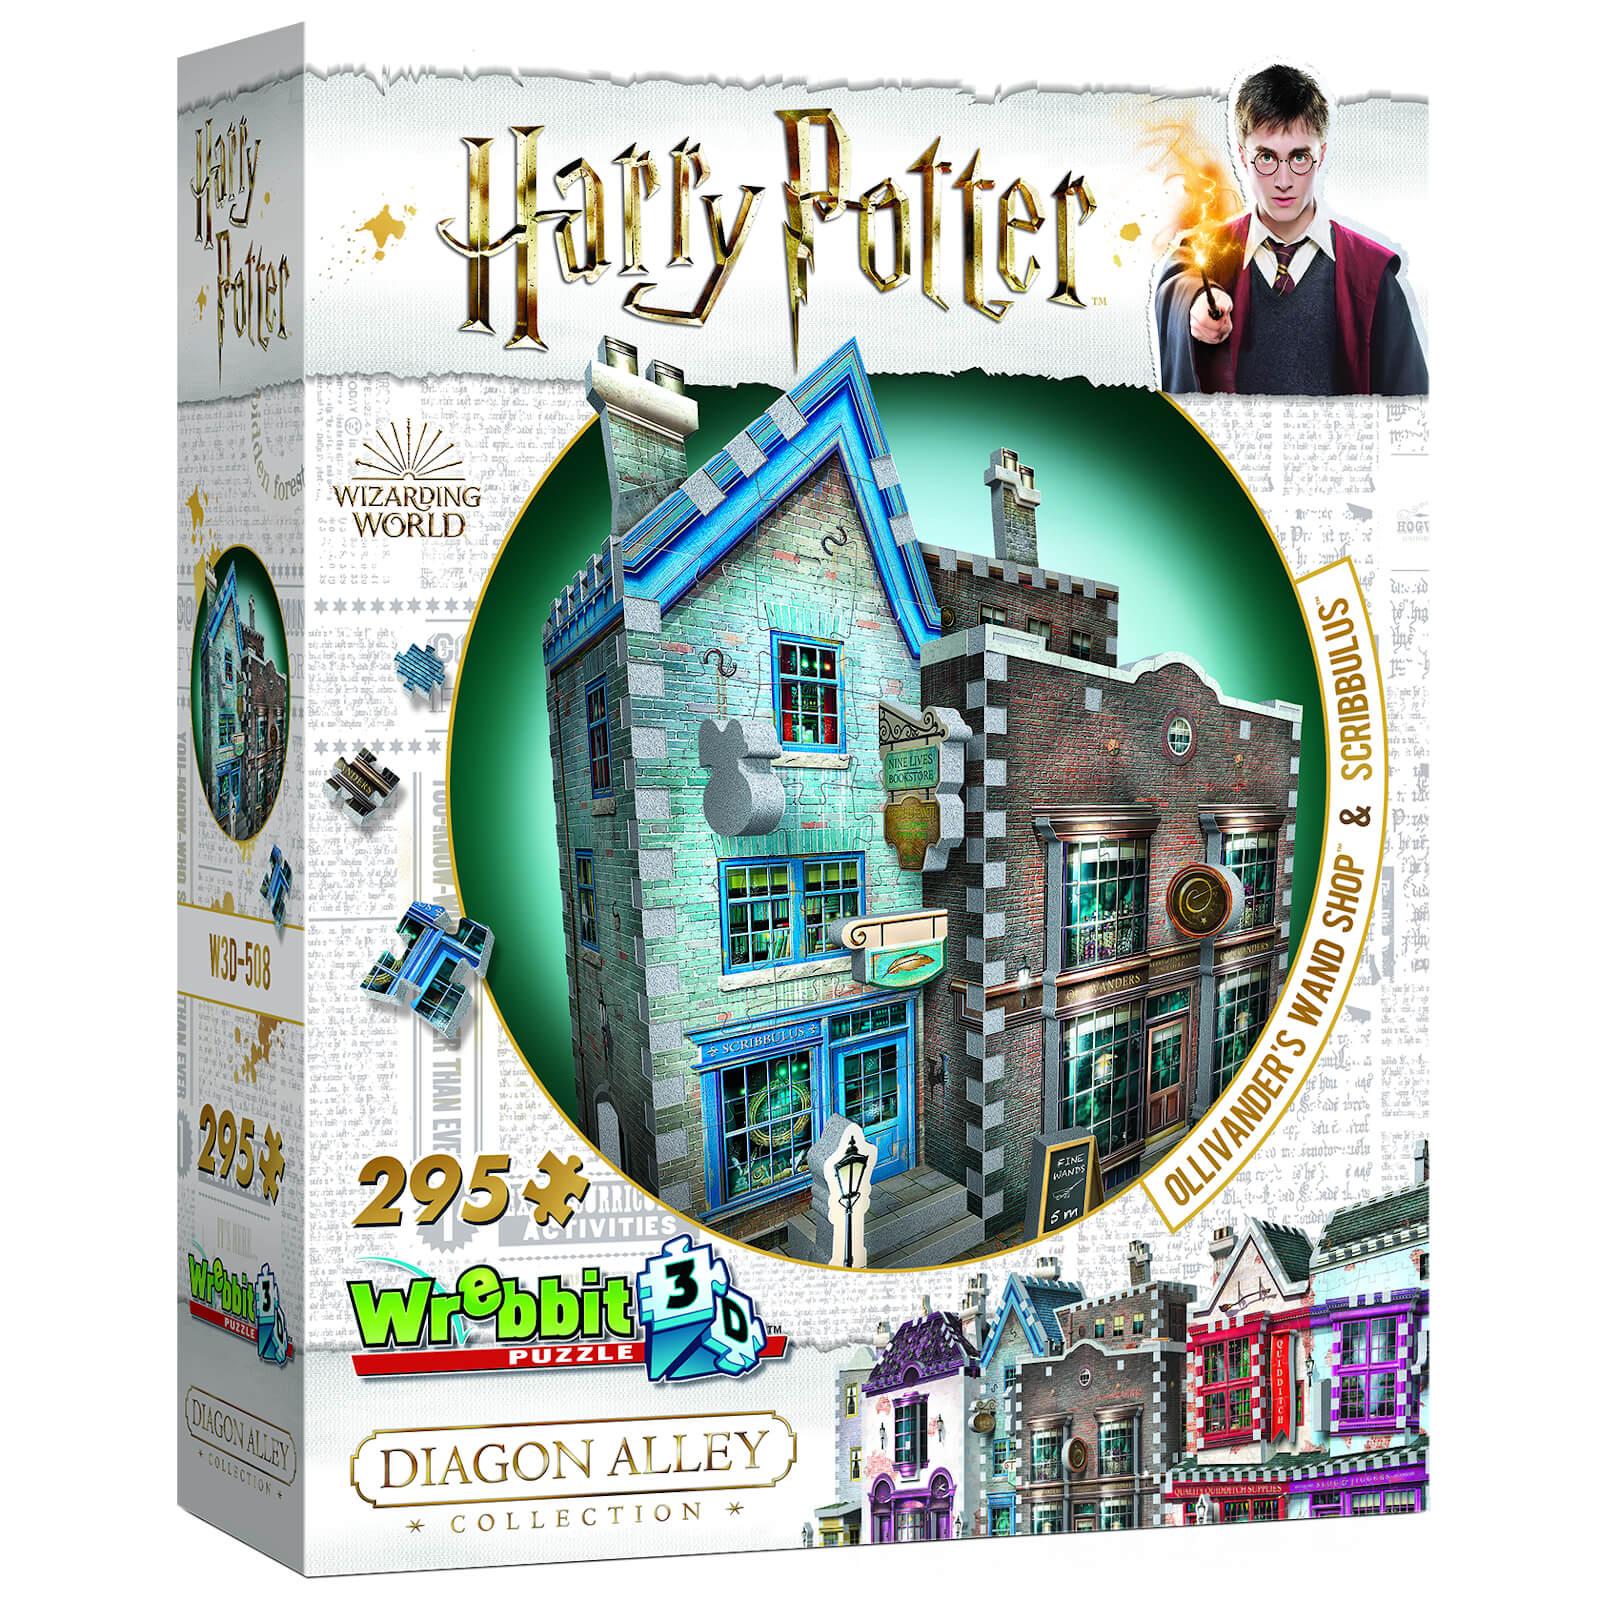 Wrebbit Harry Potter Diagon Alley Collection Ollivander's Wand Shop and Scribbulus 3D Puzzle (295 Pieces)